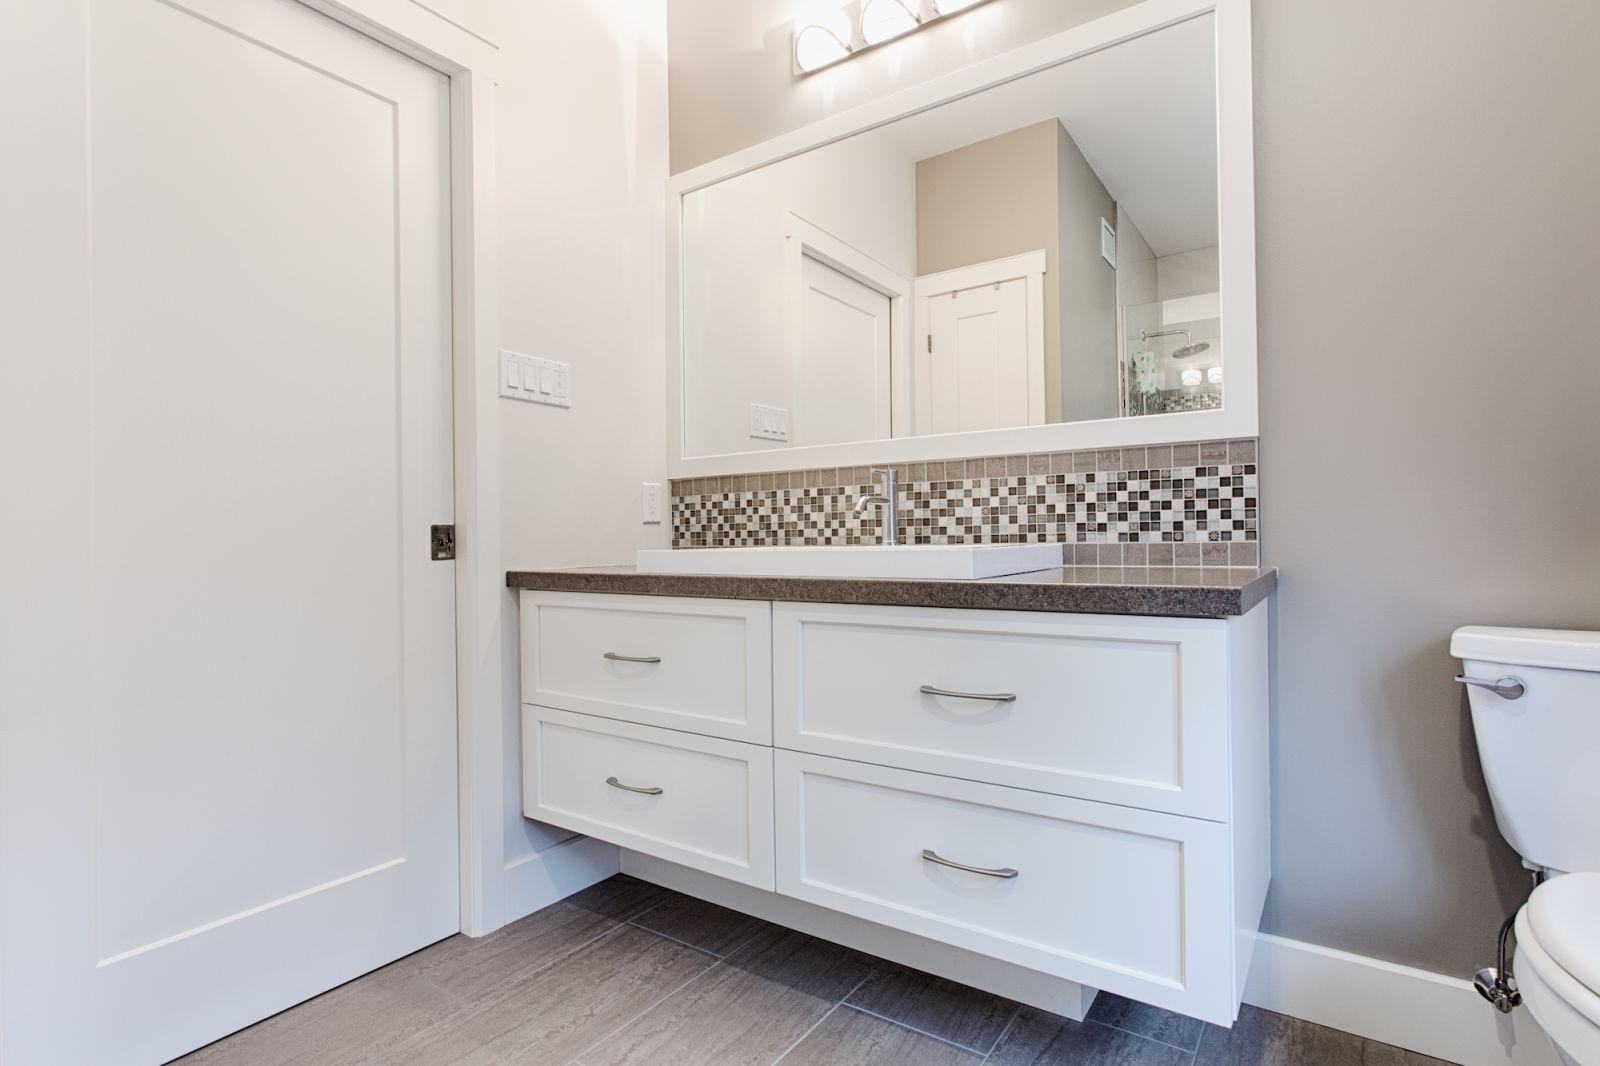 Tapis Salle De Bain Action ~ meubles de salle de bain cookshire pr s de sherbrooke en estrie